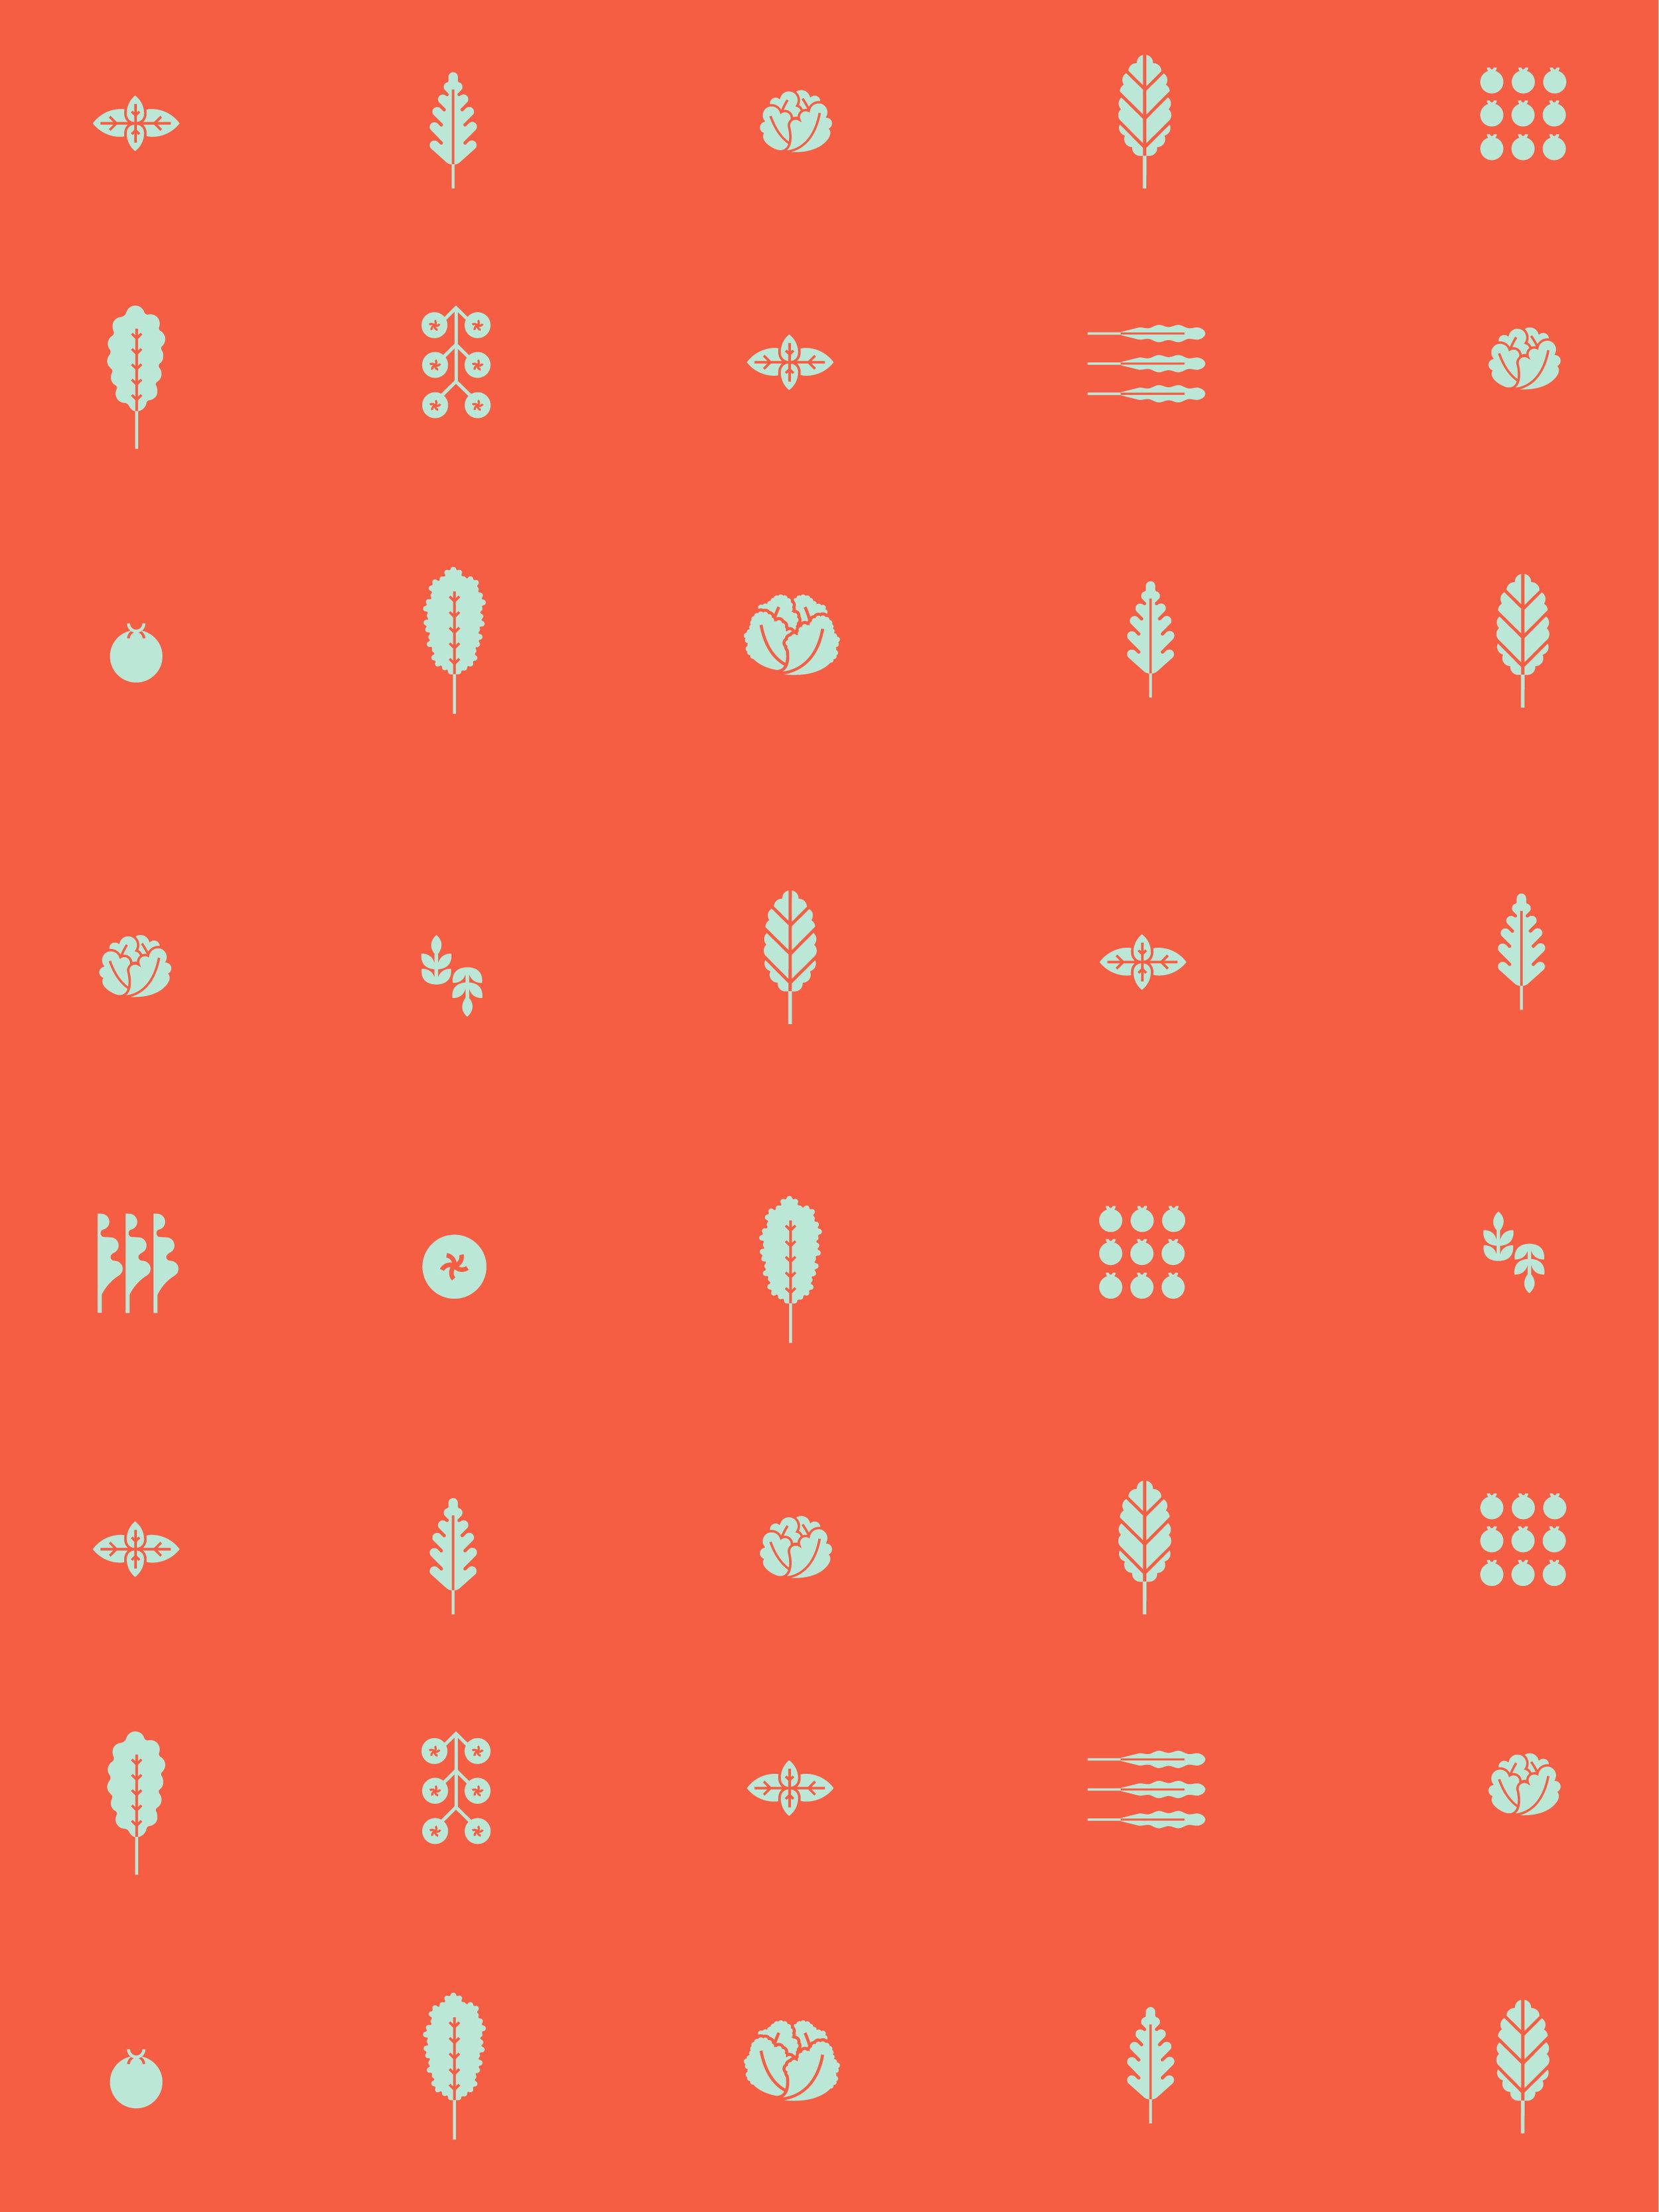 Kisano_Icons-01.jpg